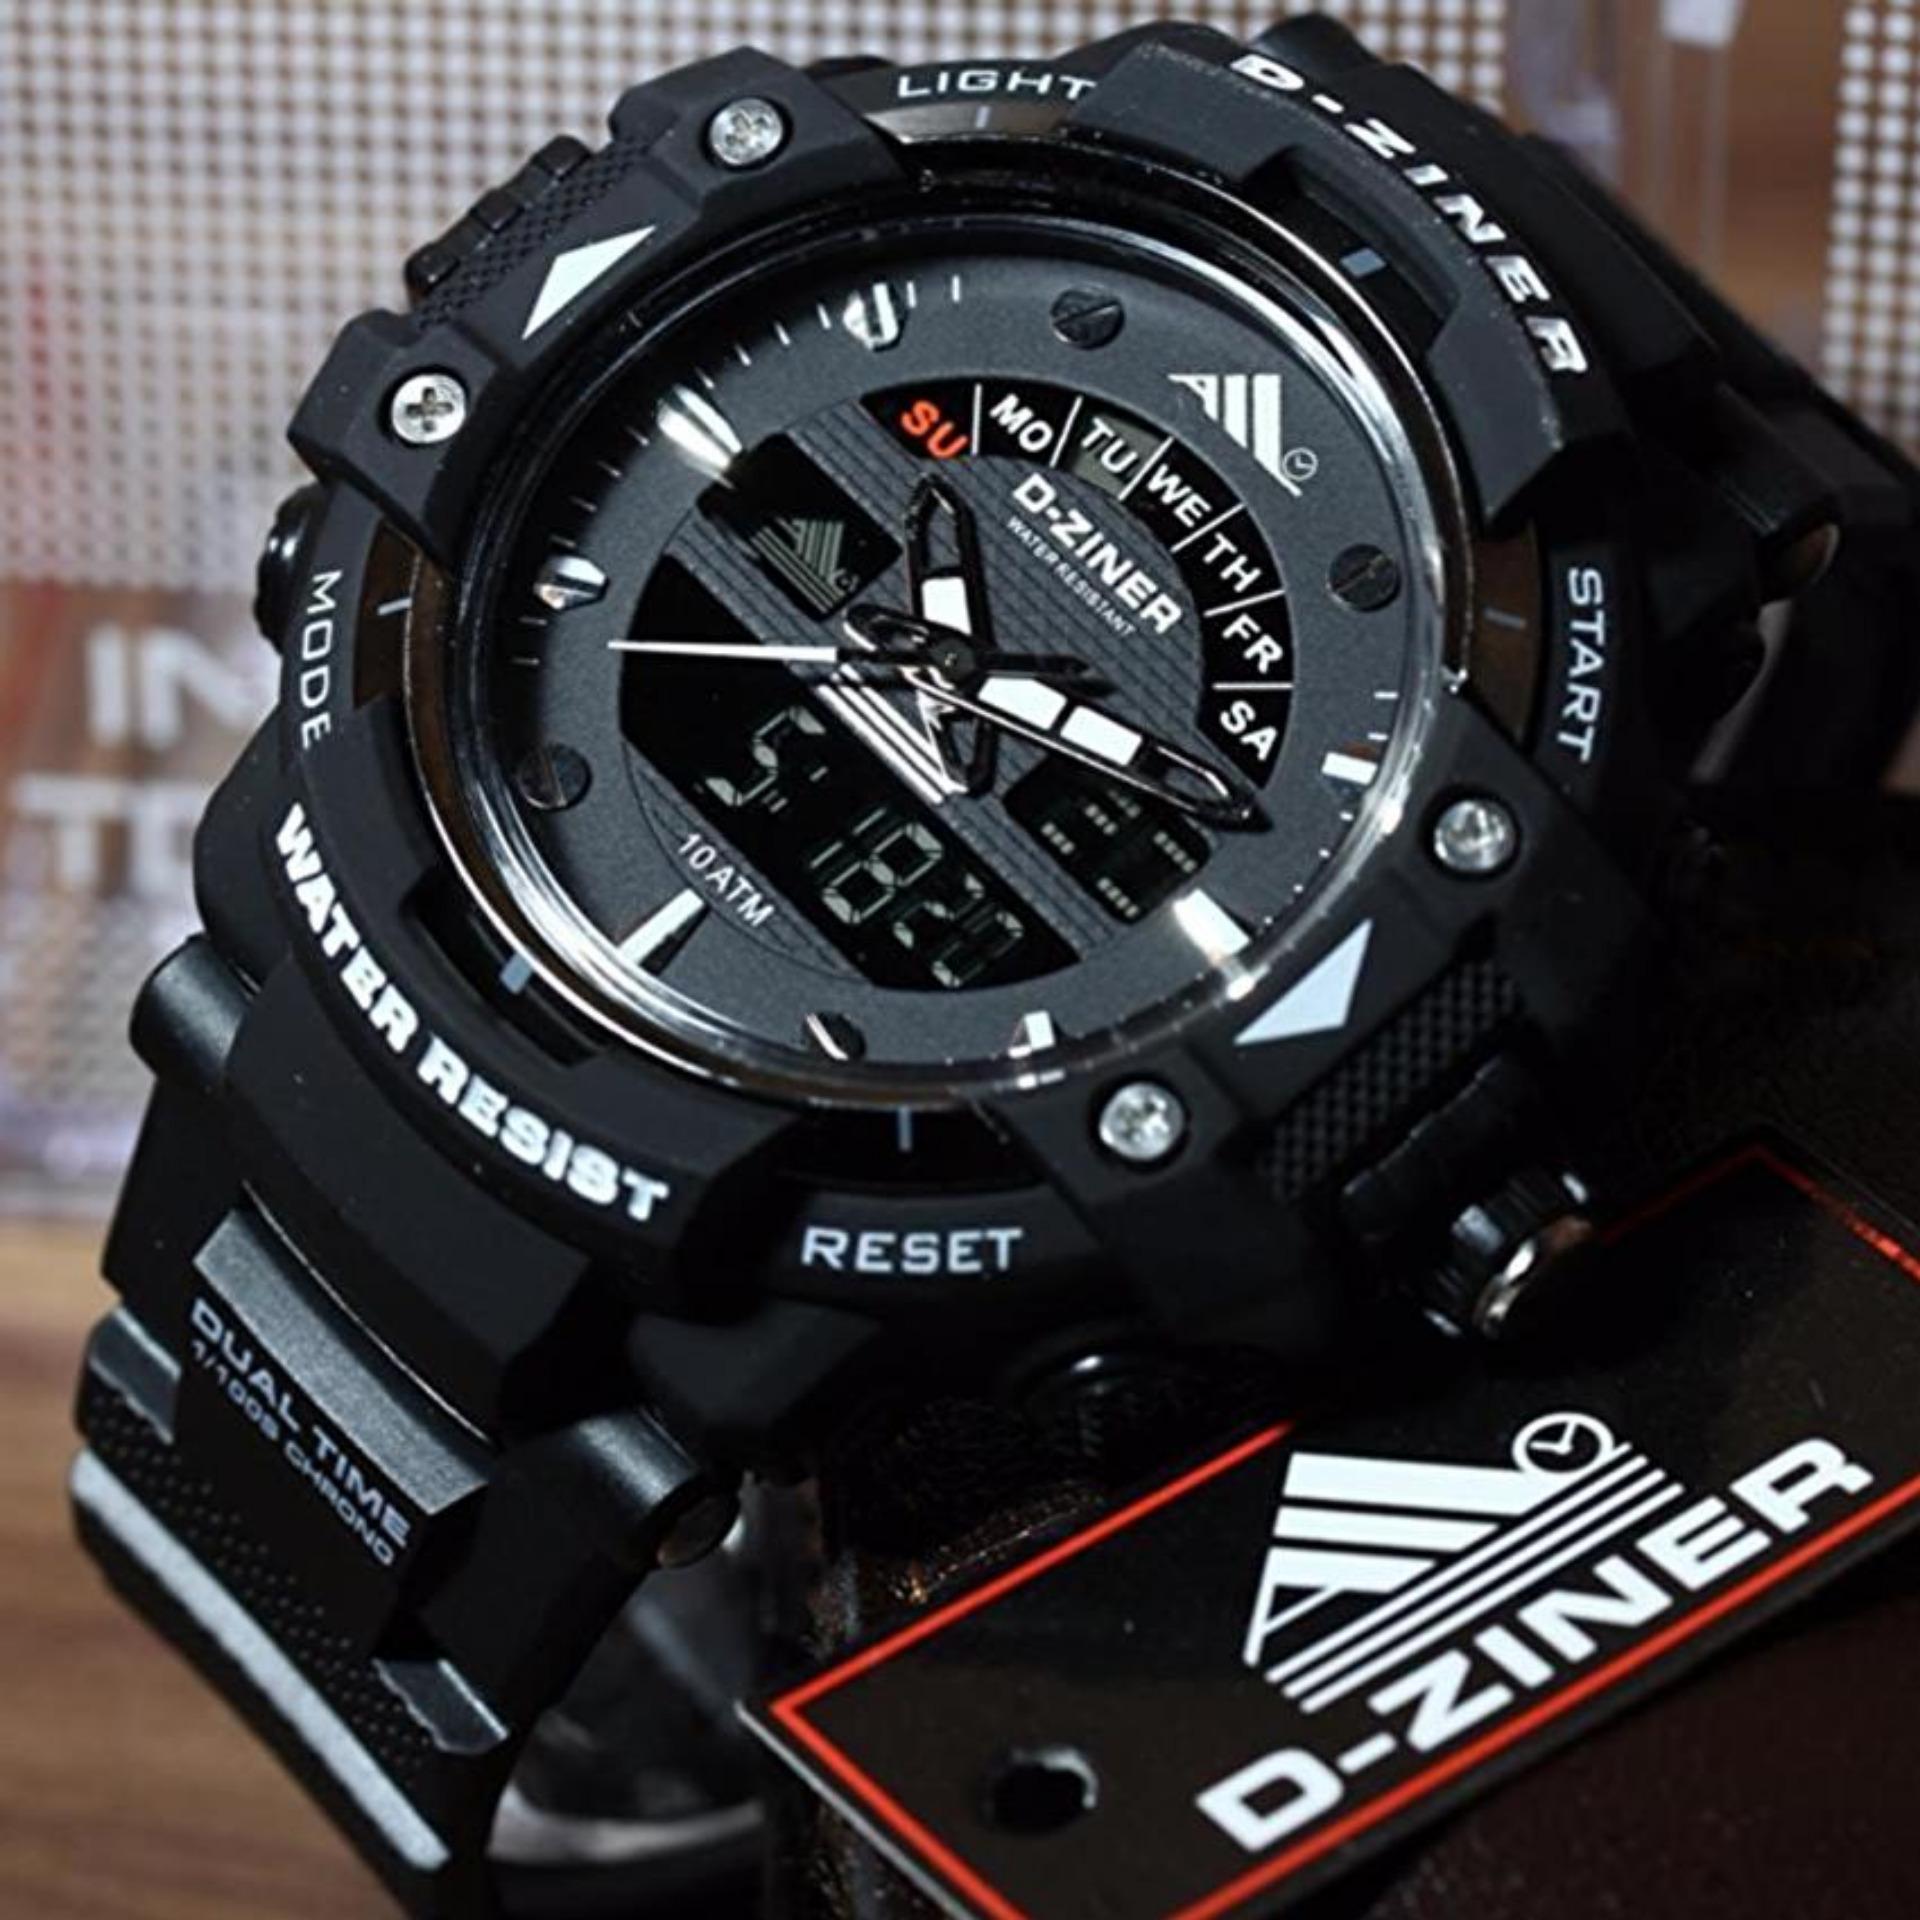 Jam Tangan Sport D-ZINER Dual Time - DZ760-461BW Pria Rubber